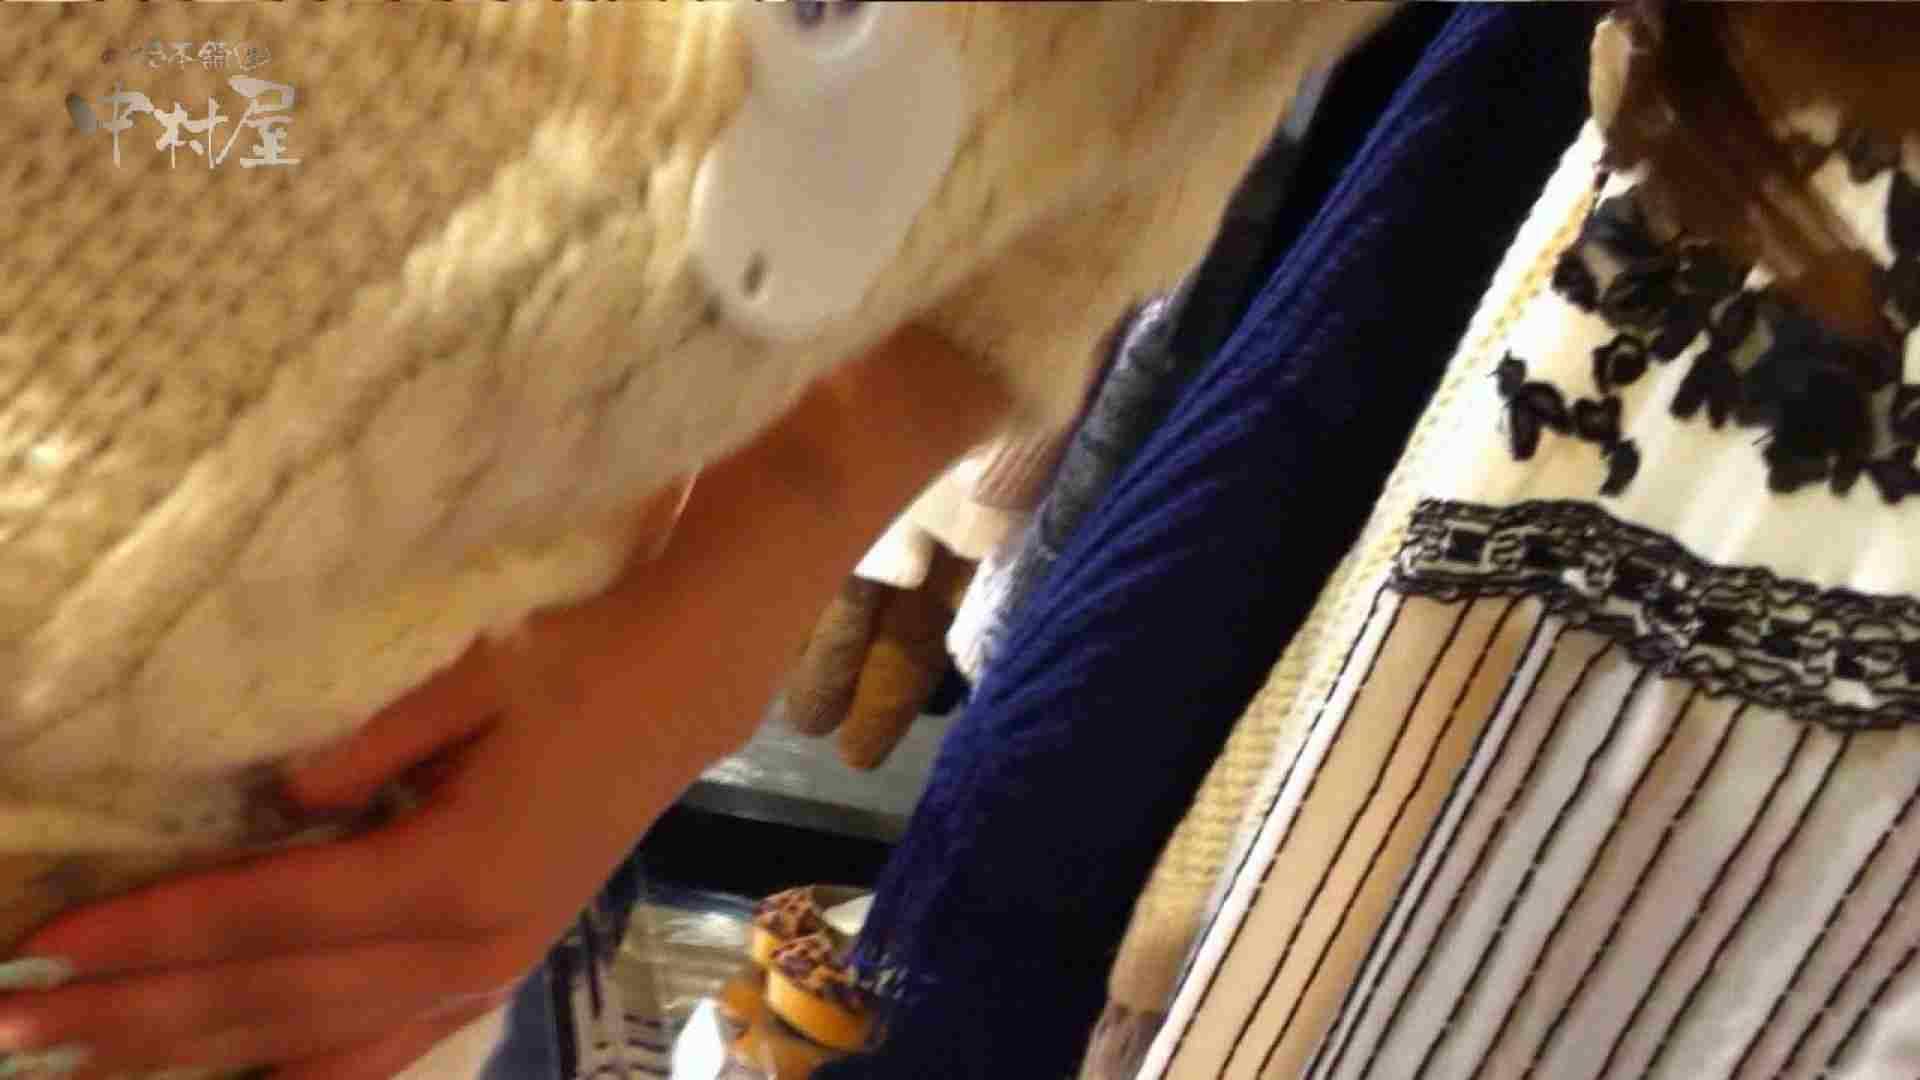 vol.73 美人アパレル胸チラ&パンチラ 目の下のホクロがエッチな店員さん エッチ 盗み撮りAV無料動画キャプチャ 103画像 53